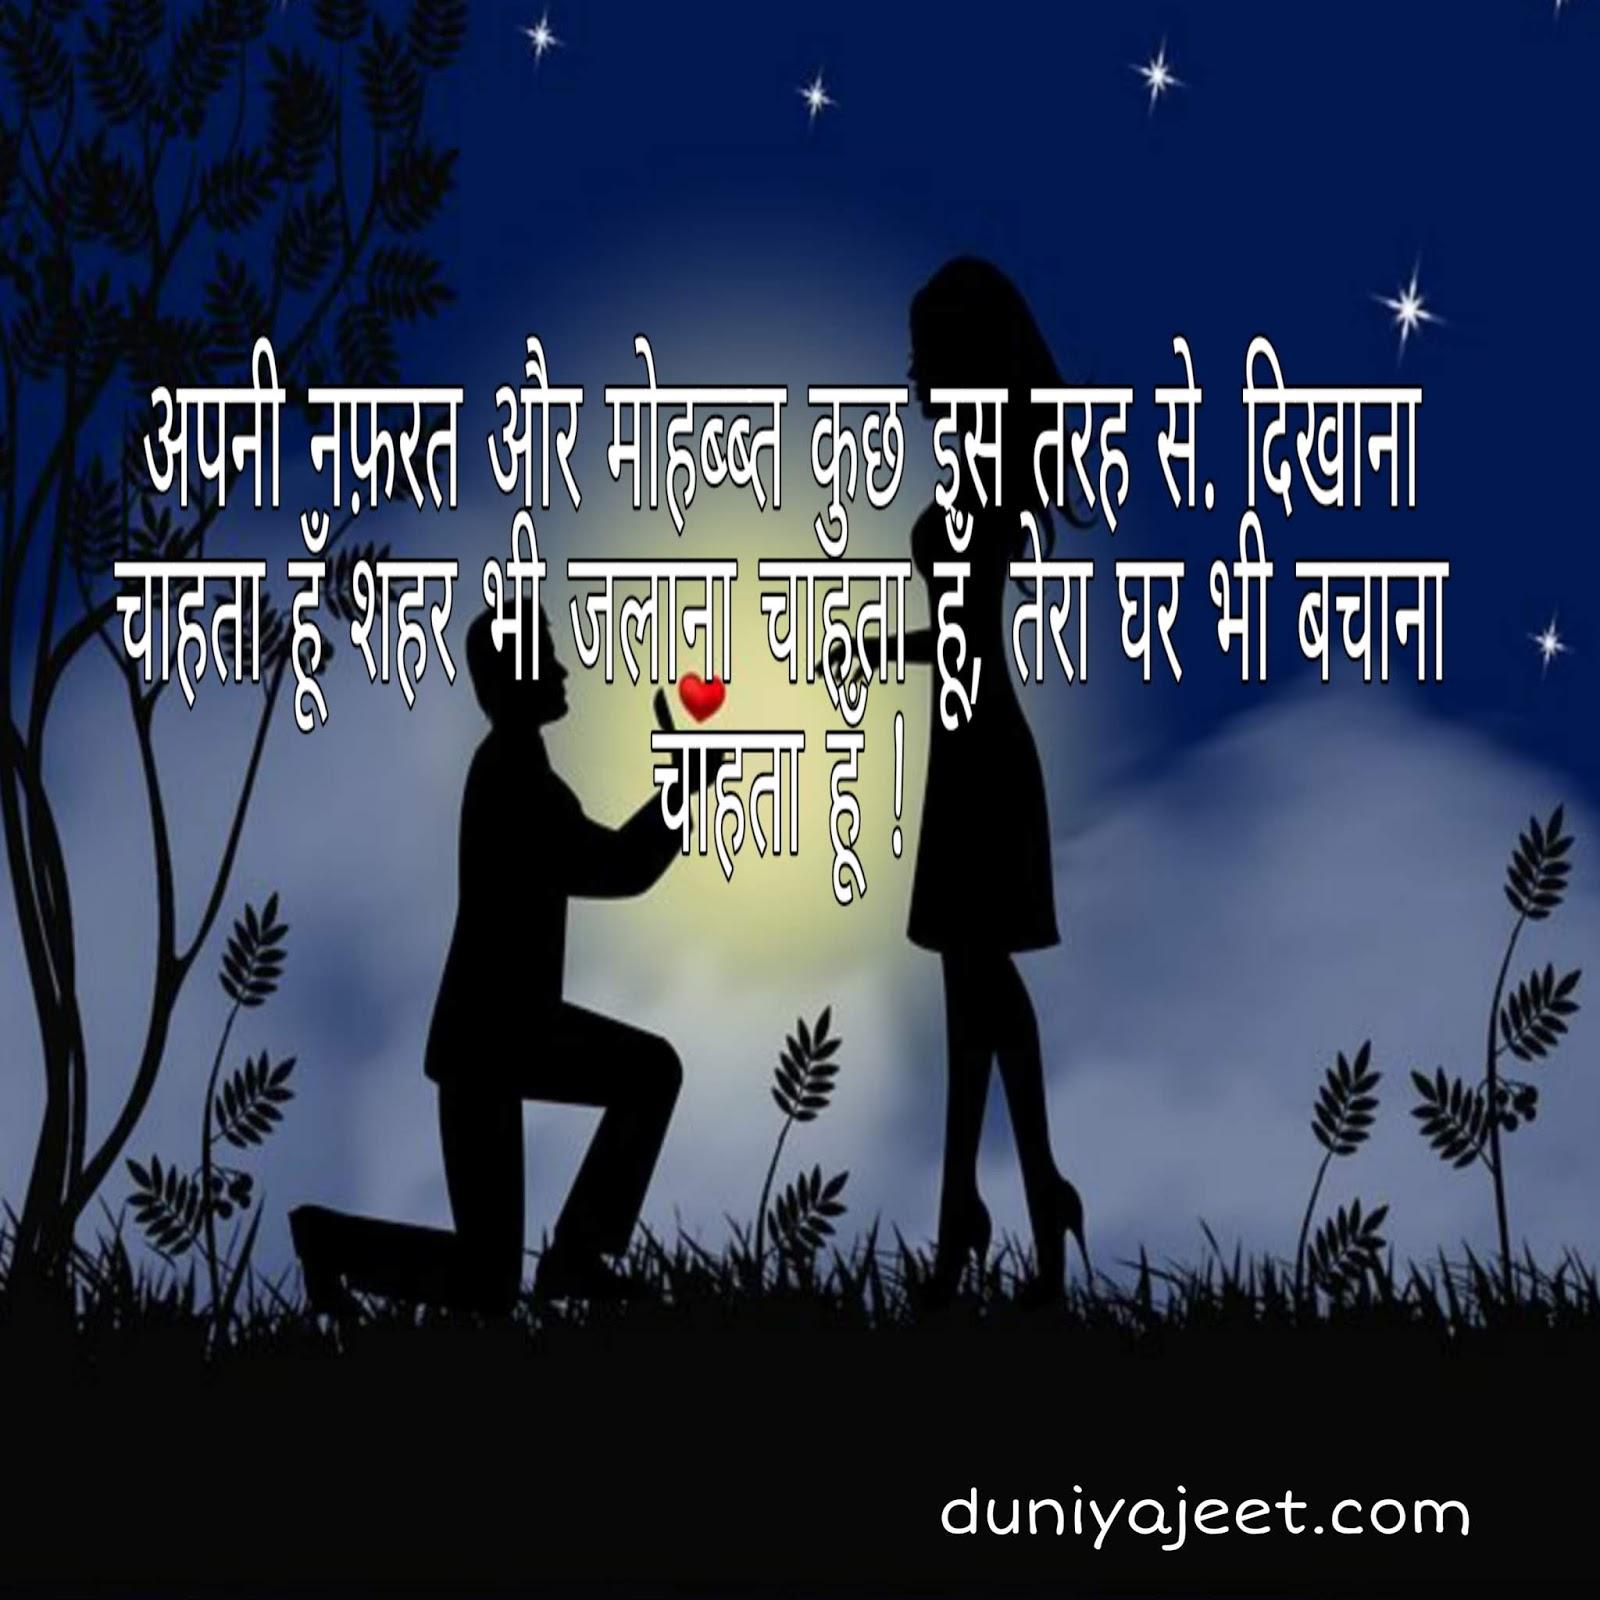 Best fb status, whatsapp royal attitude status in hindi 2019-20